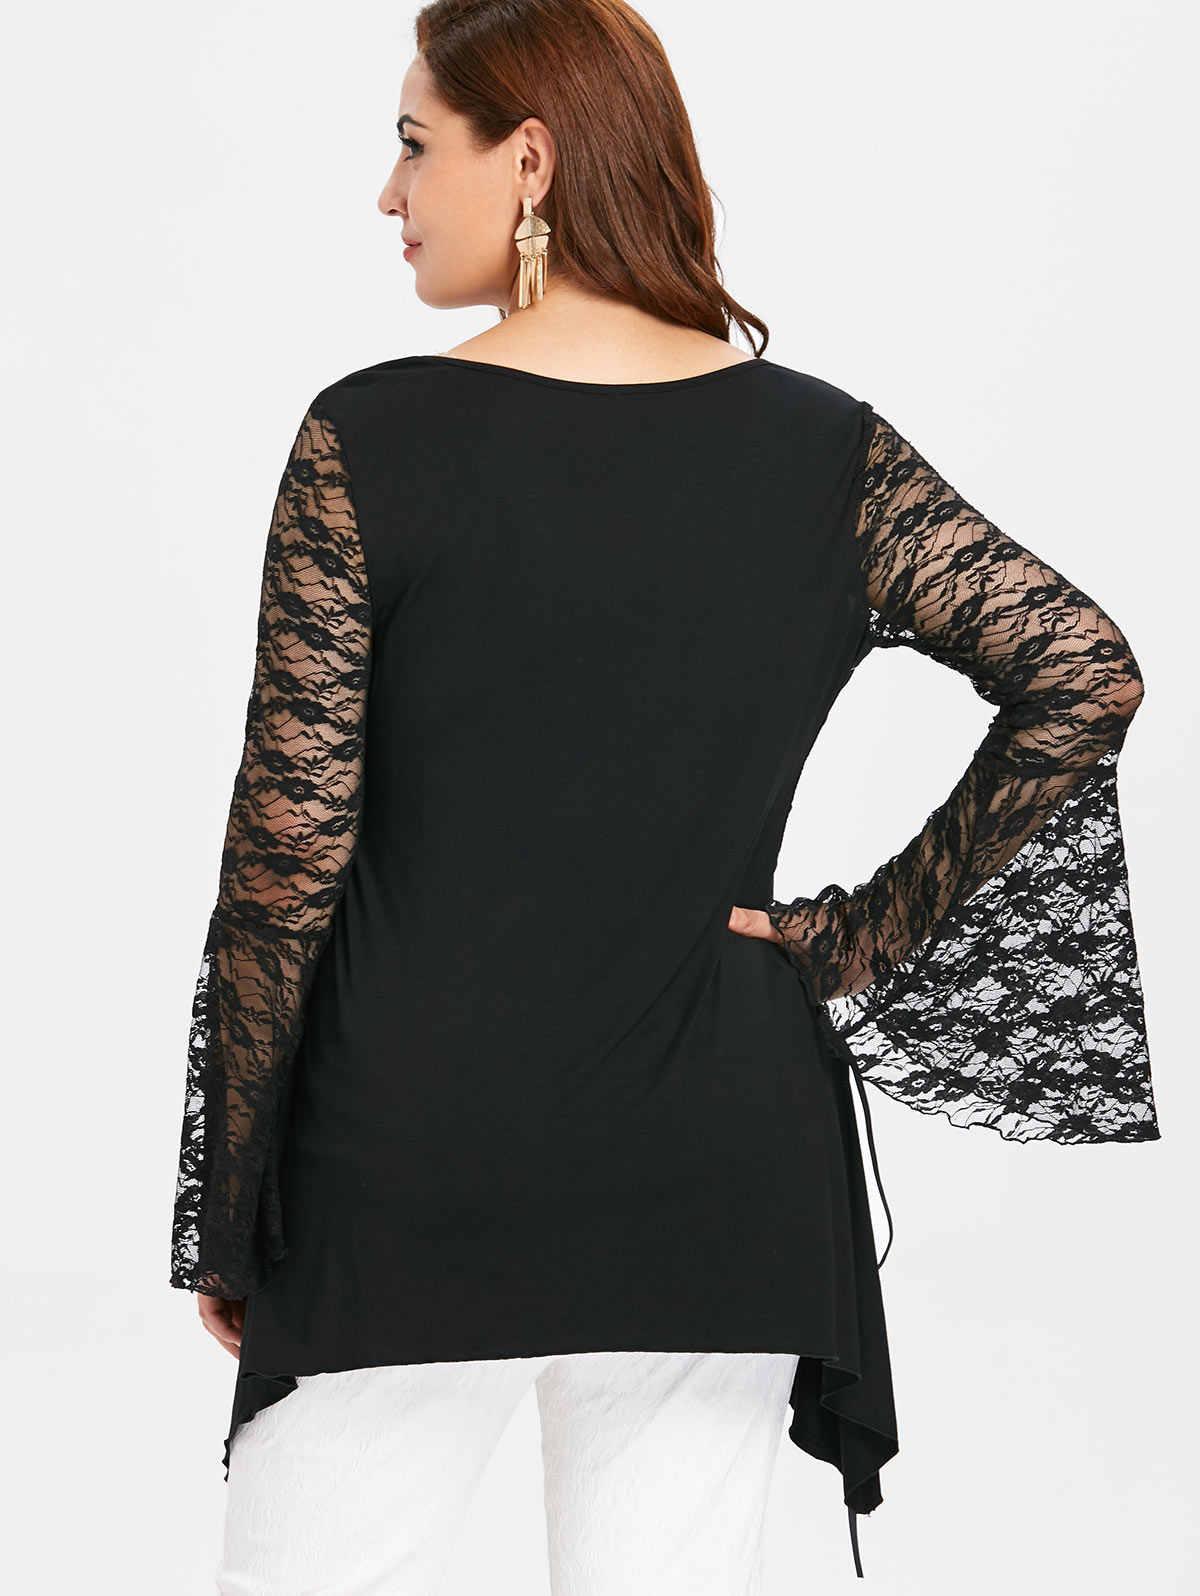 Wipalo de talla grande 5XL puro encaje de manga larga de Halloween camiseta negro sólido cuello redondo acampanado manga de encaje hasta el lado túnica camiseta